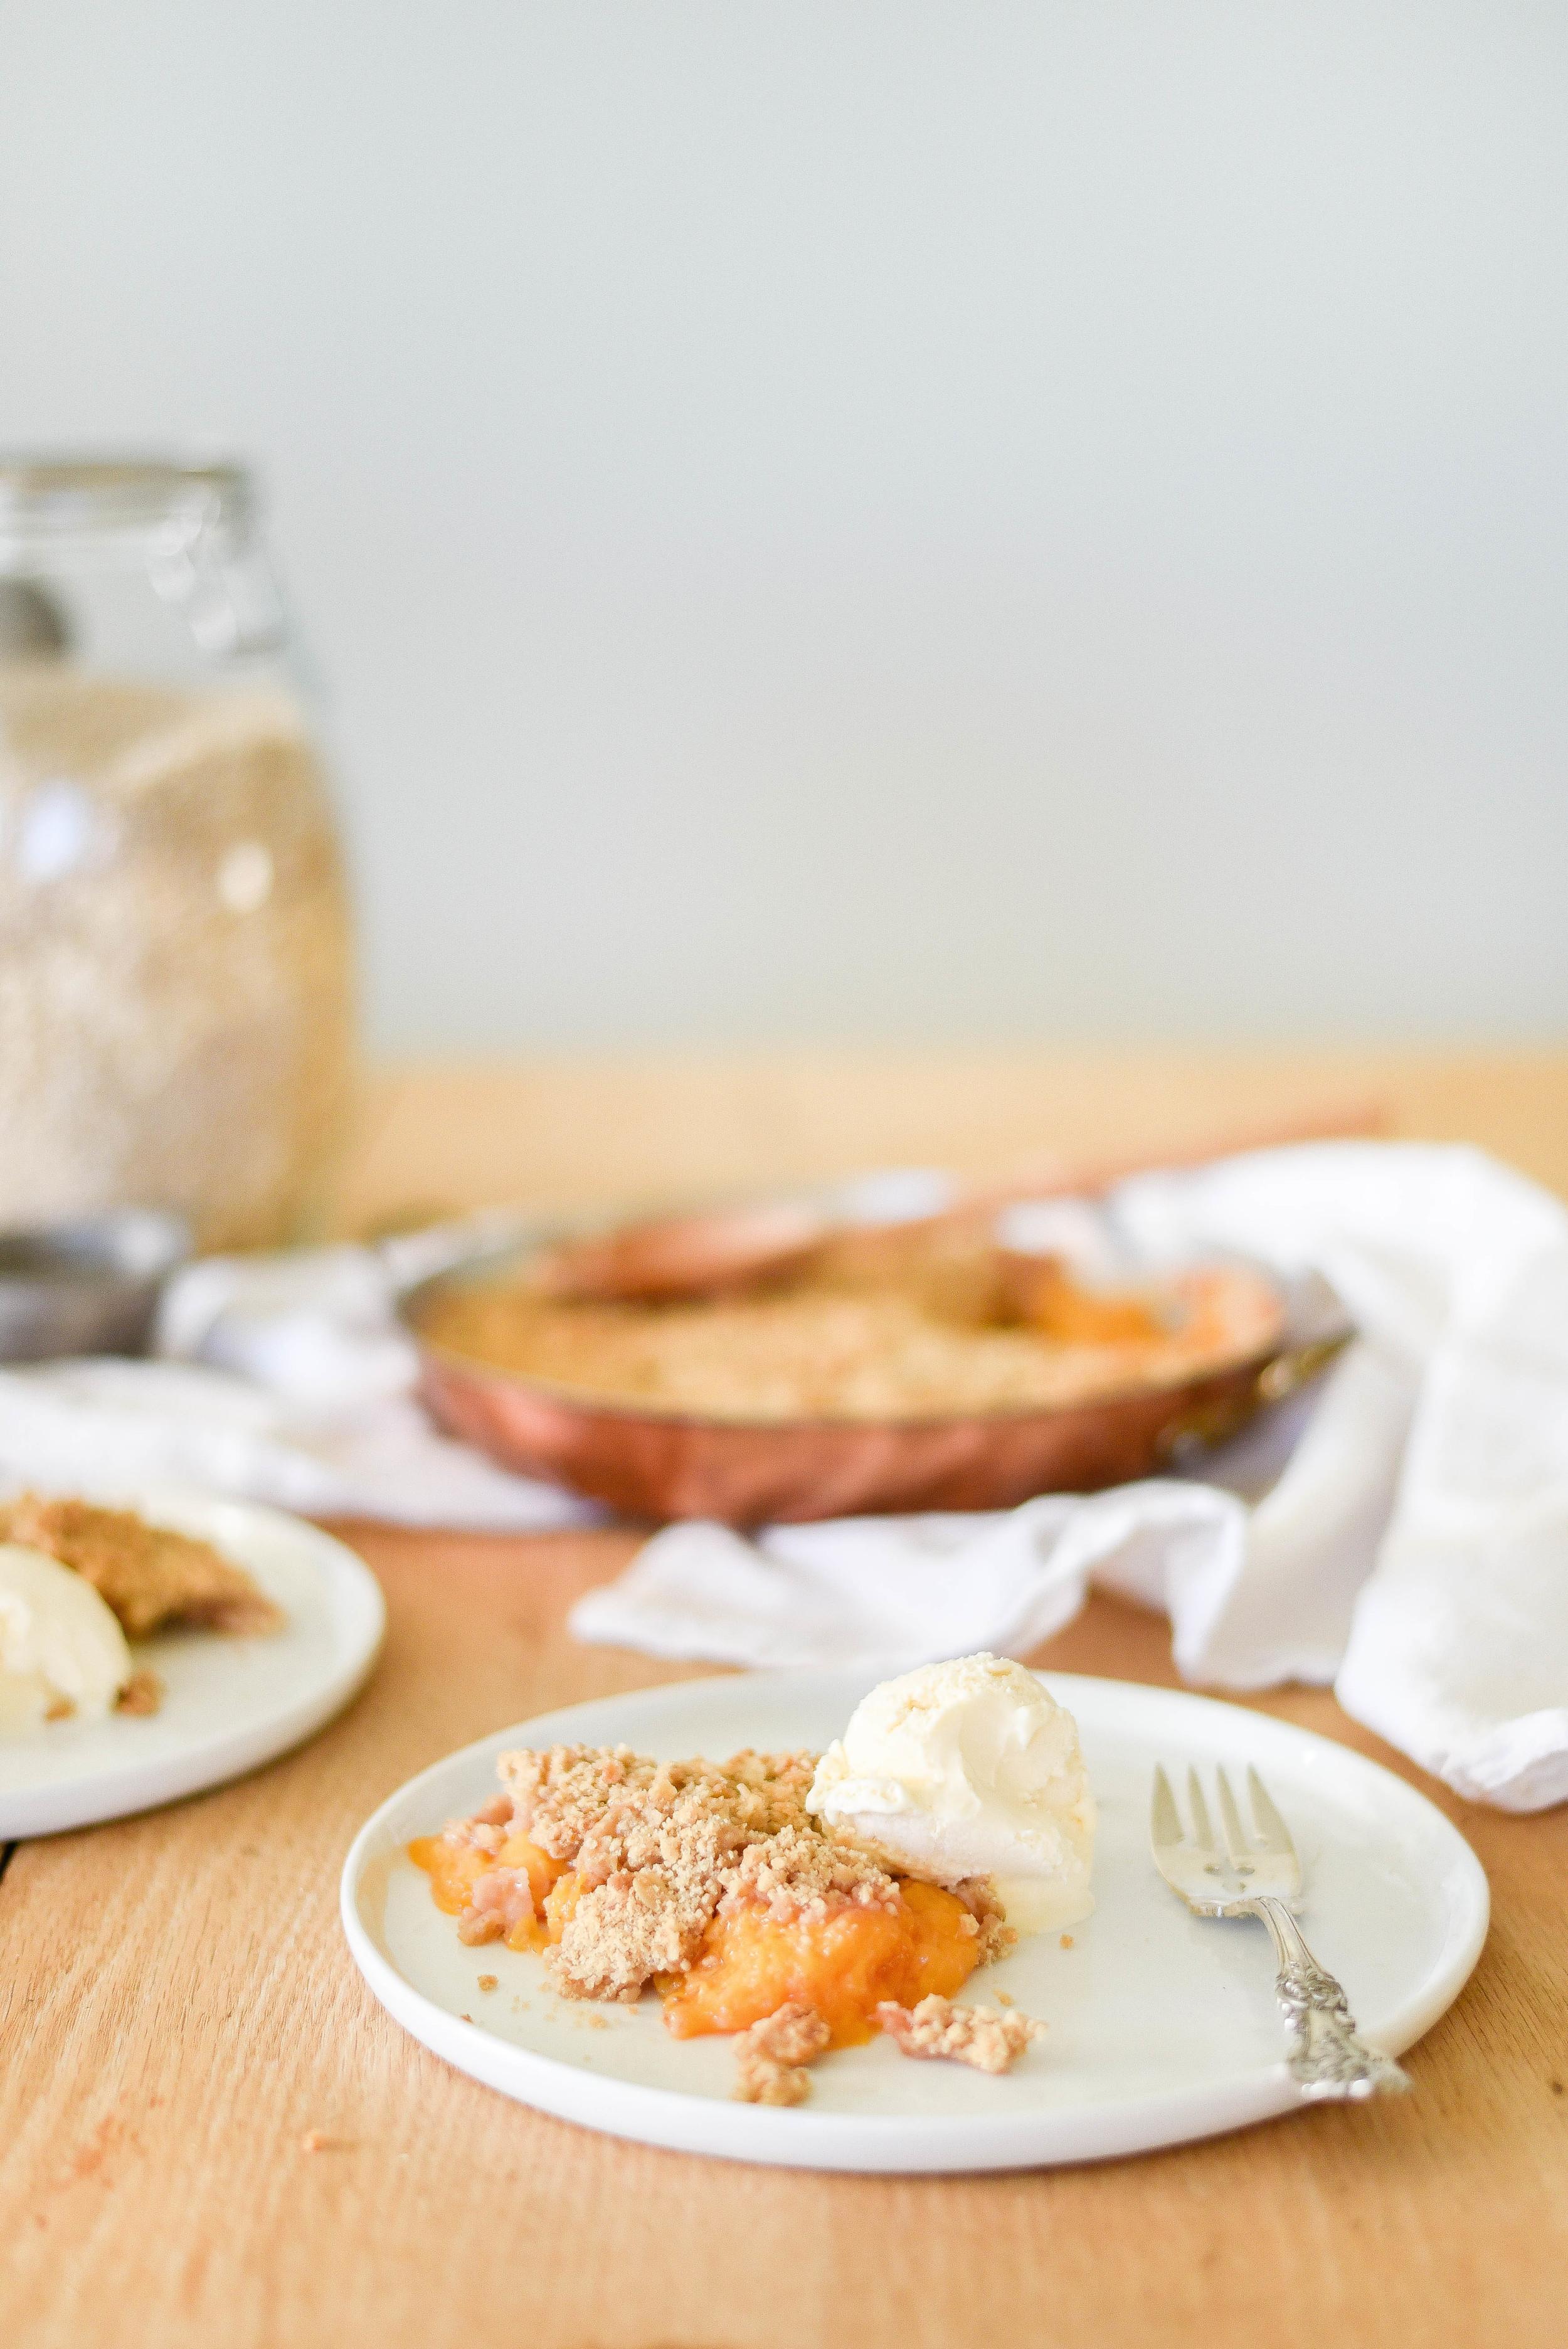 Easy peach crisp recipe with less butter! | boxwoodavenue.com